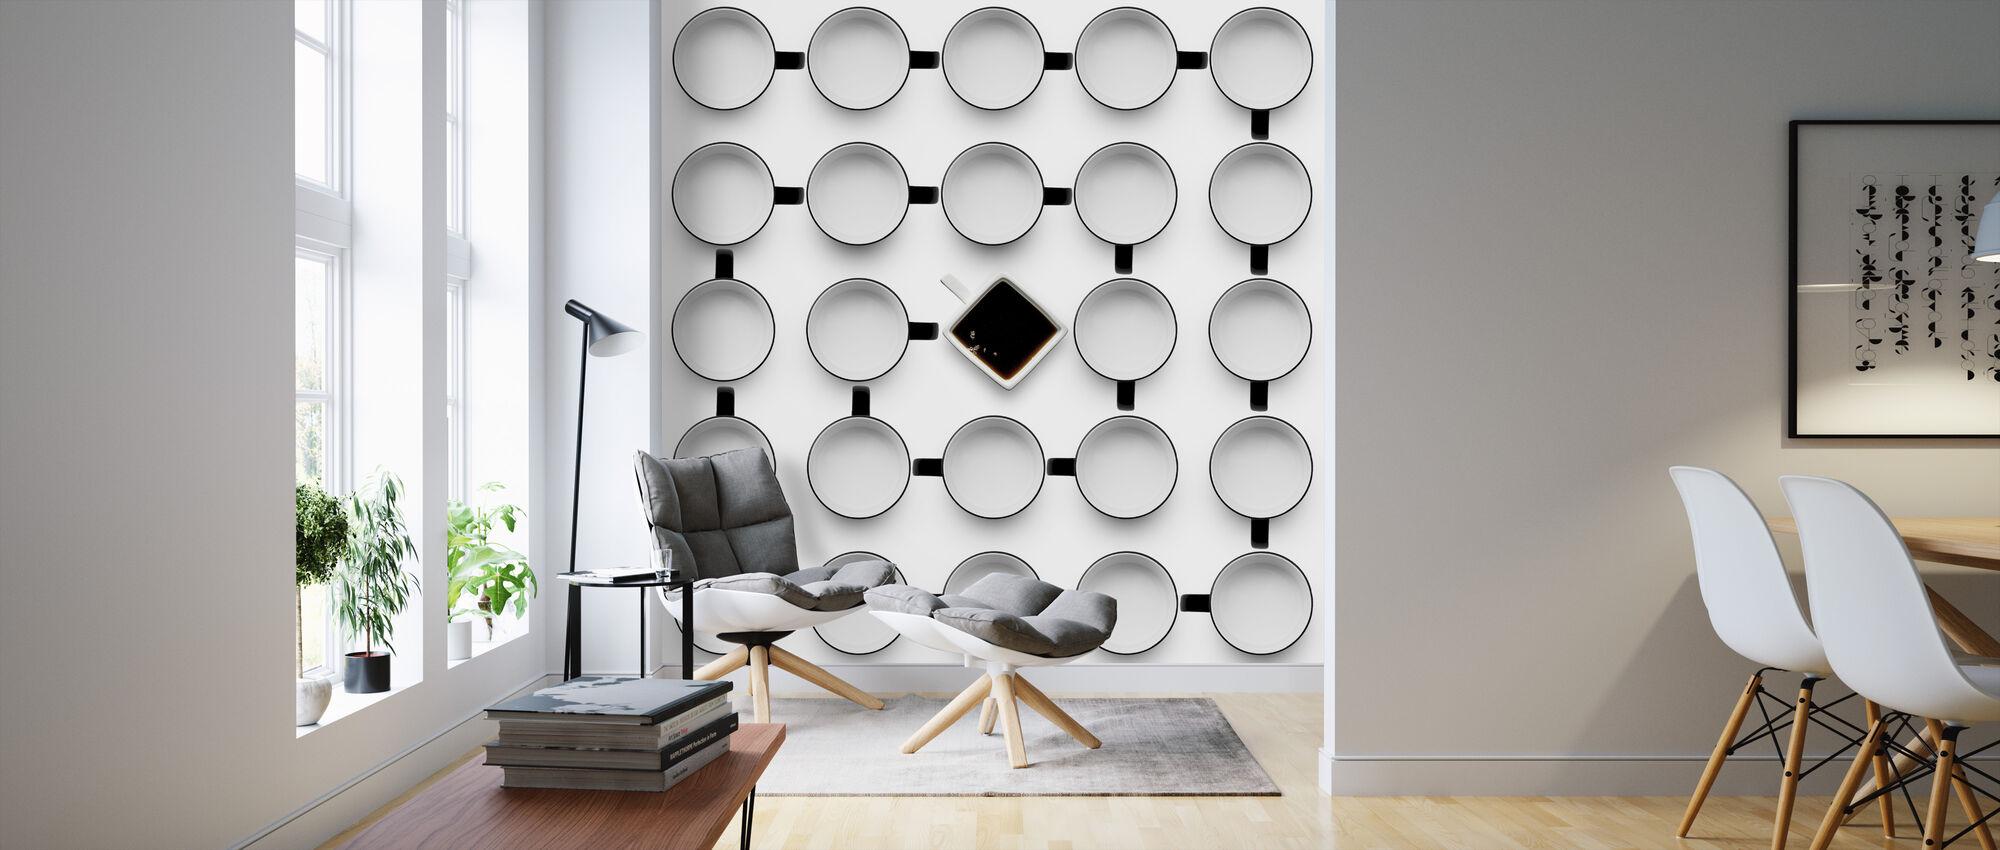 Helix - Wallpaper - Living Room